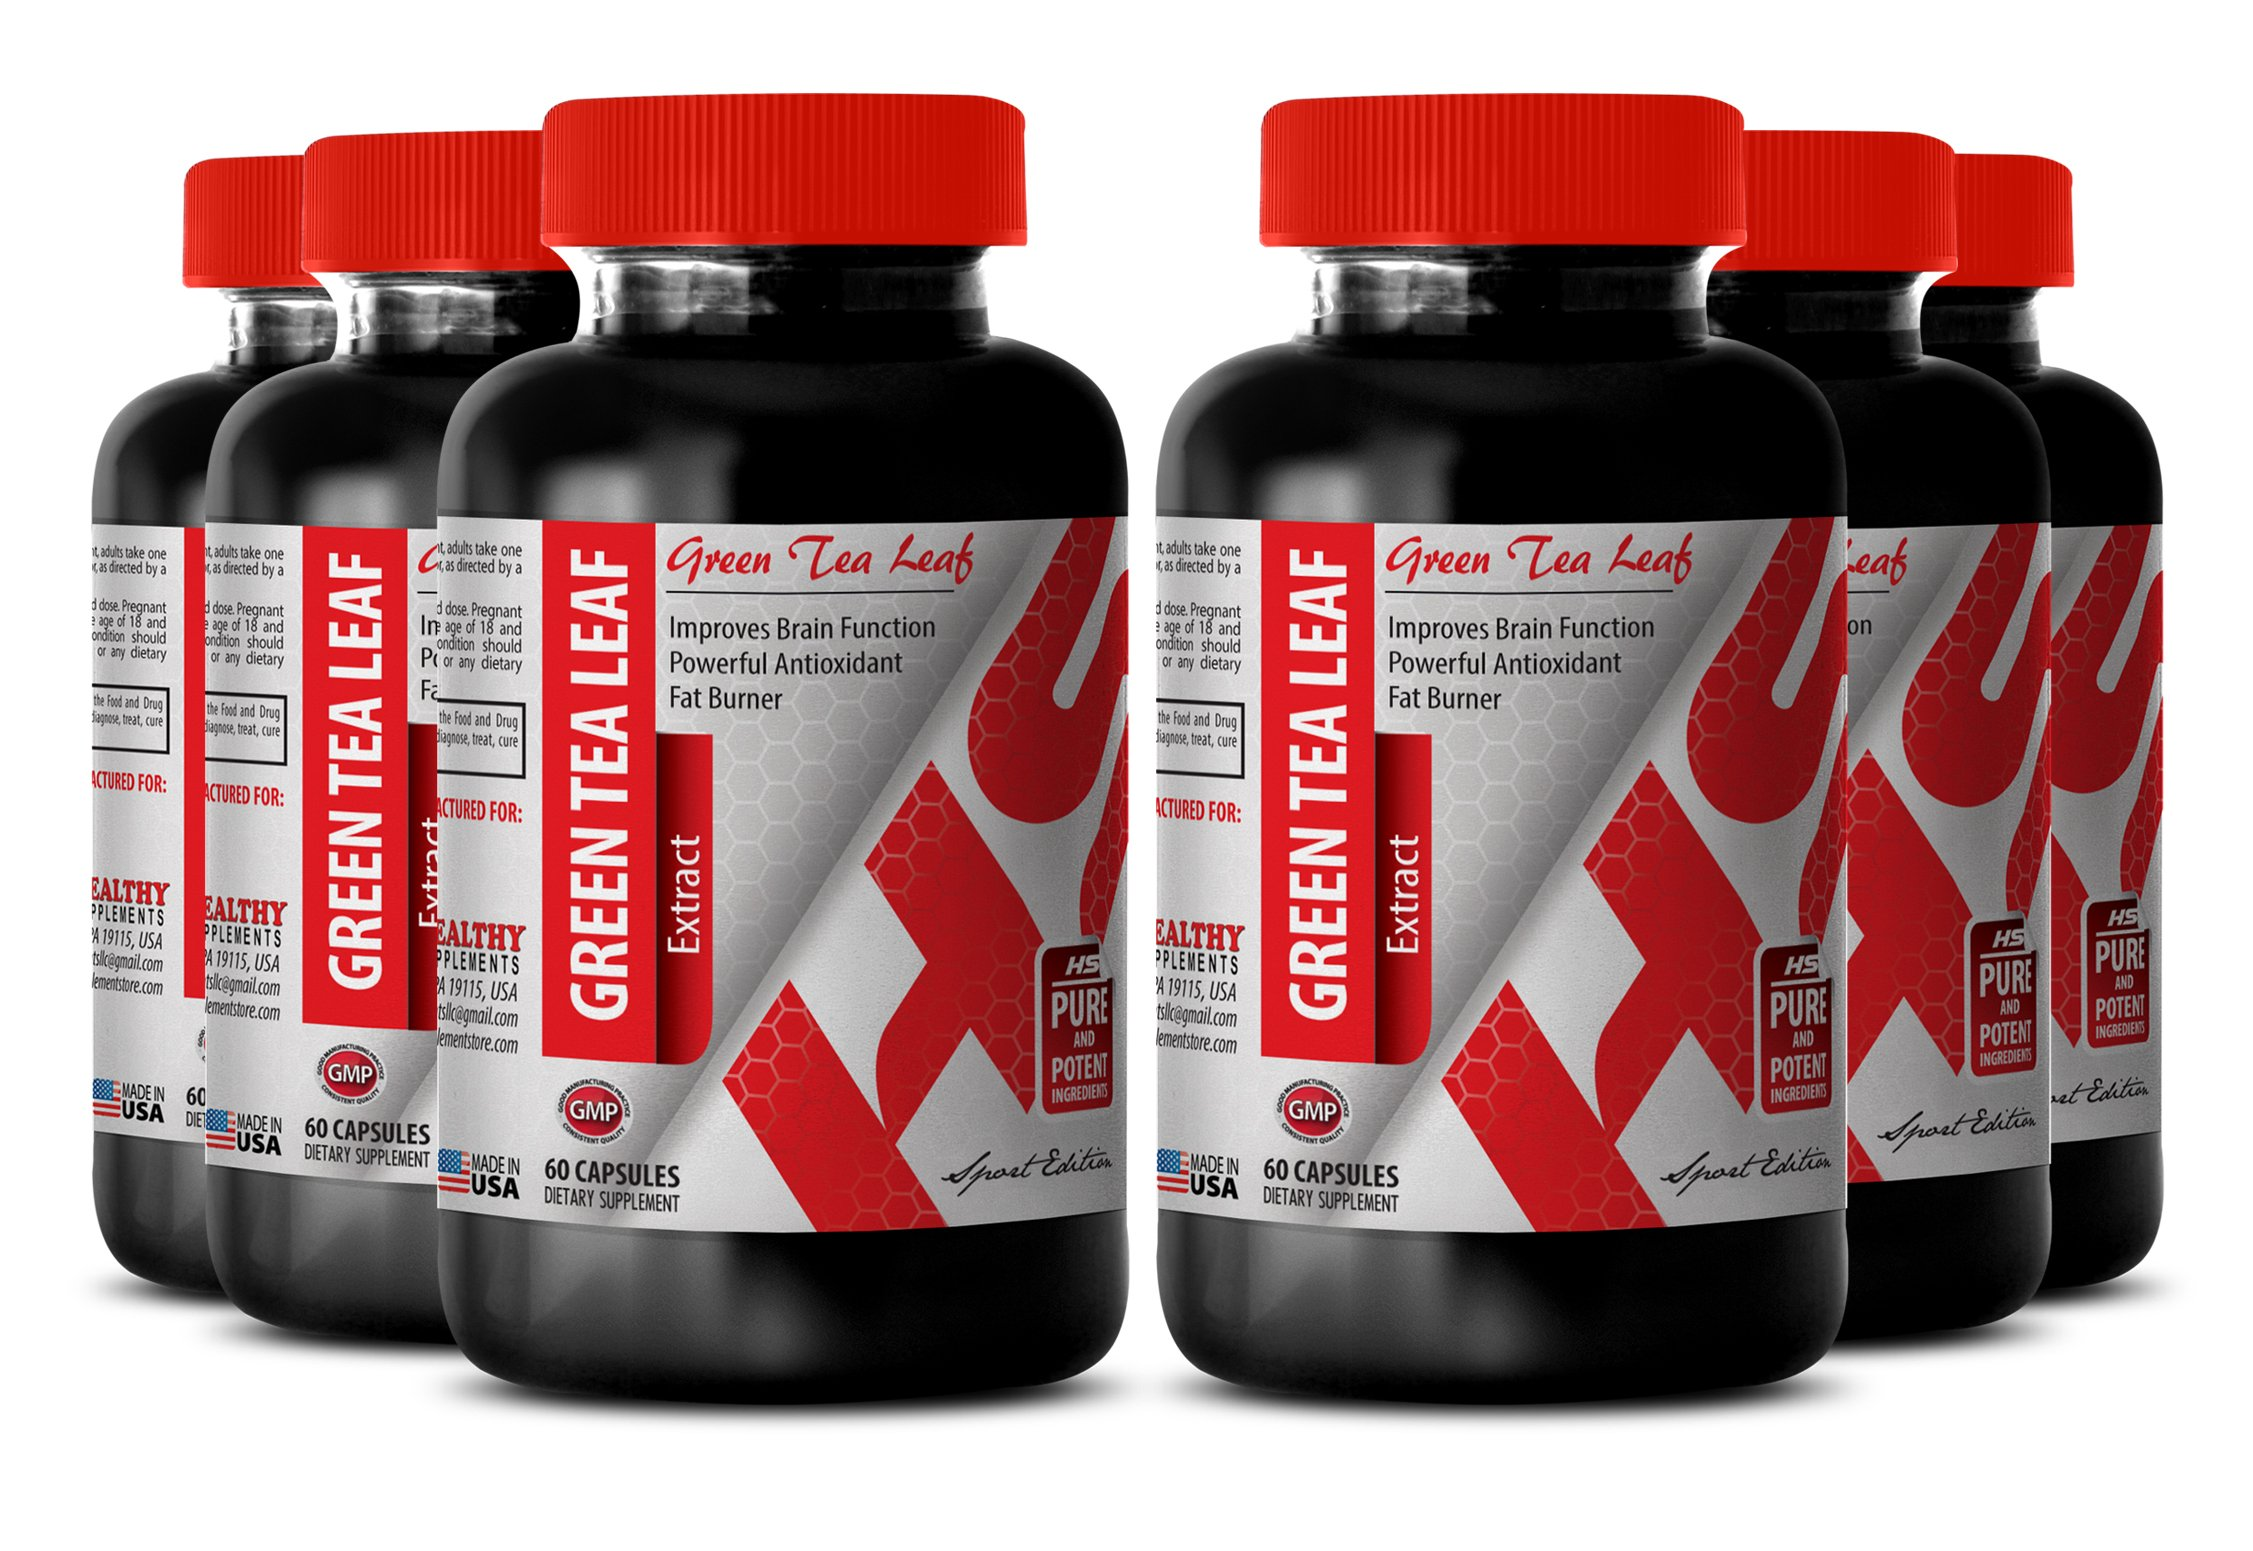 Green tea green coffee - 300 MG GREEN TEA LEAF EXTRACT - weight loss supplement (6 Bottles)